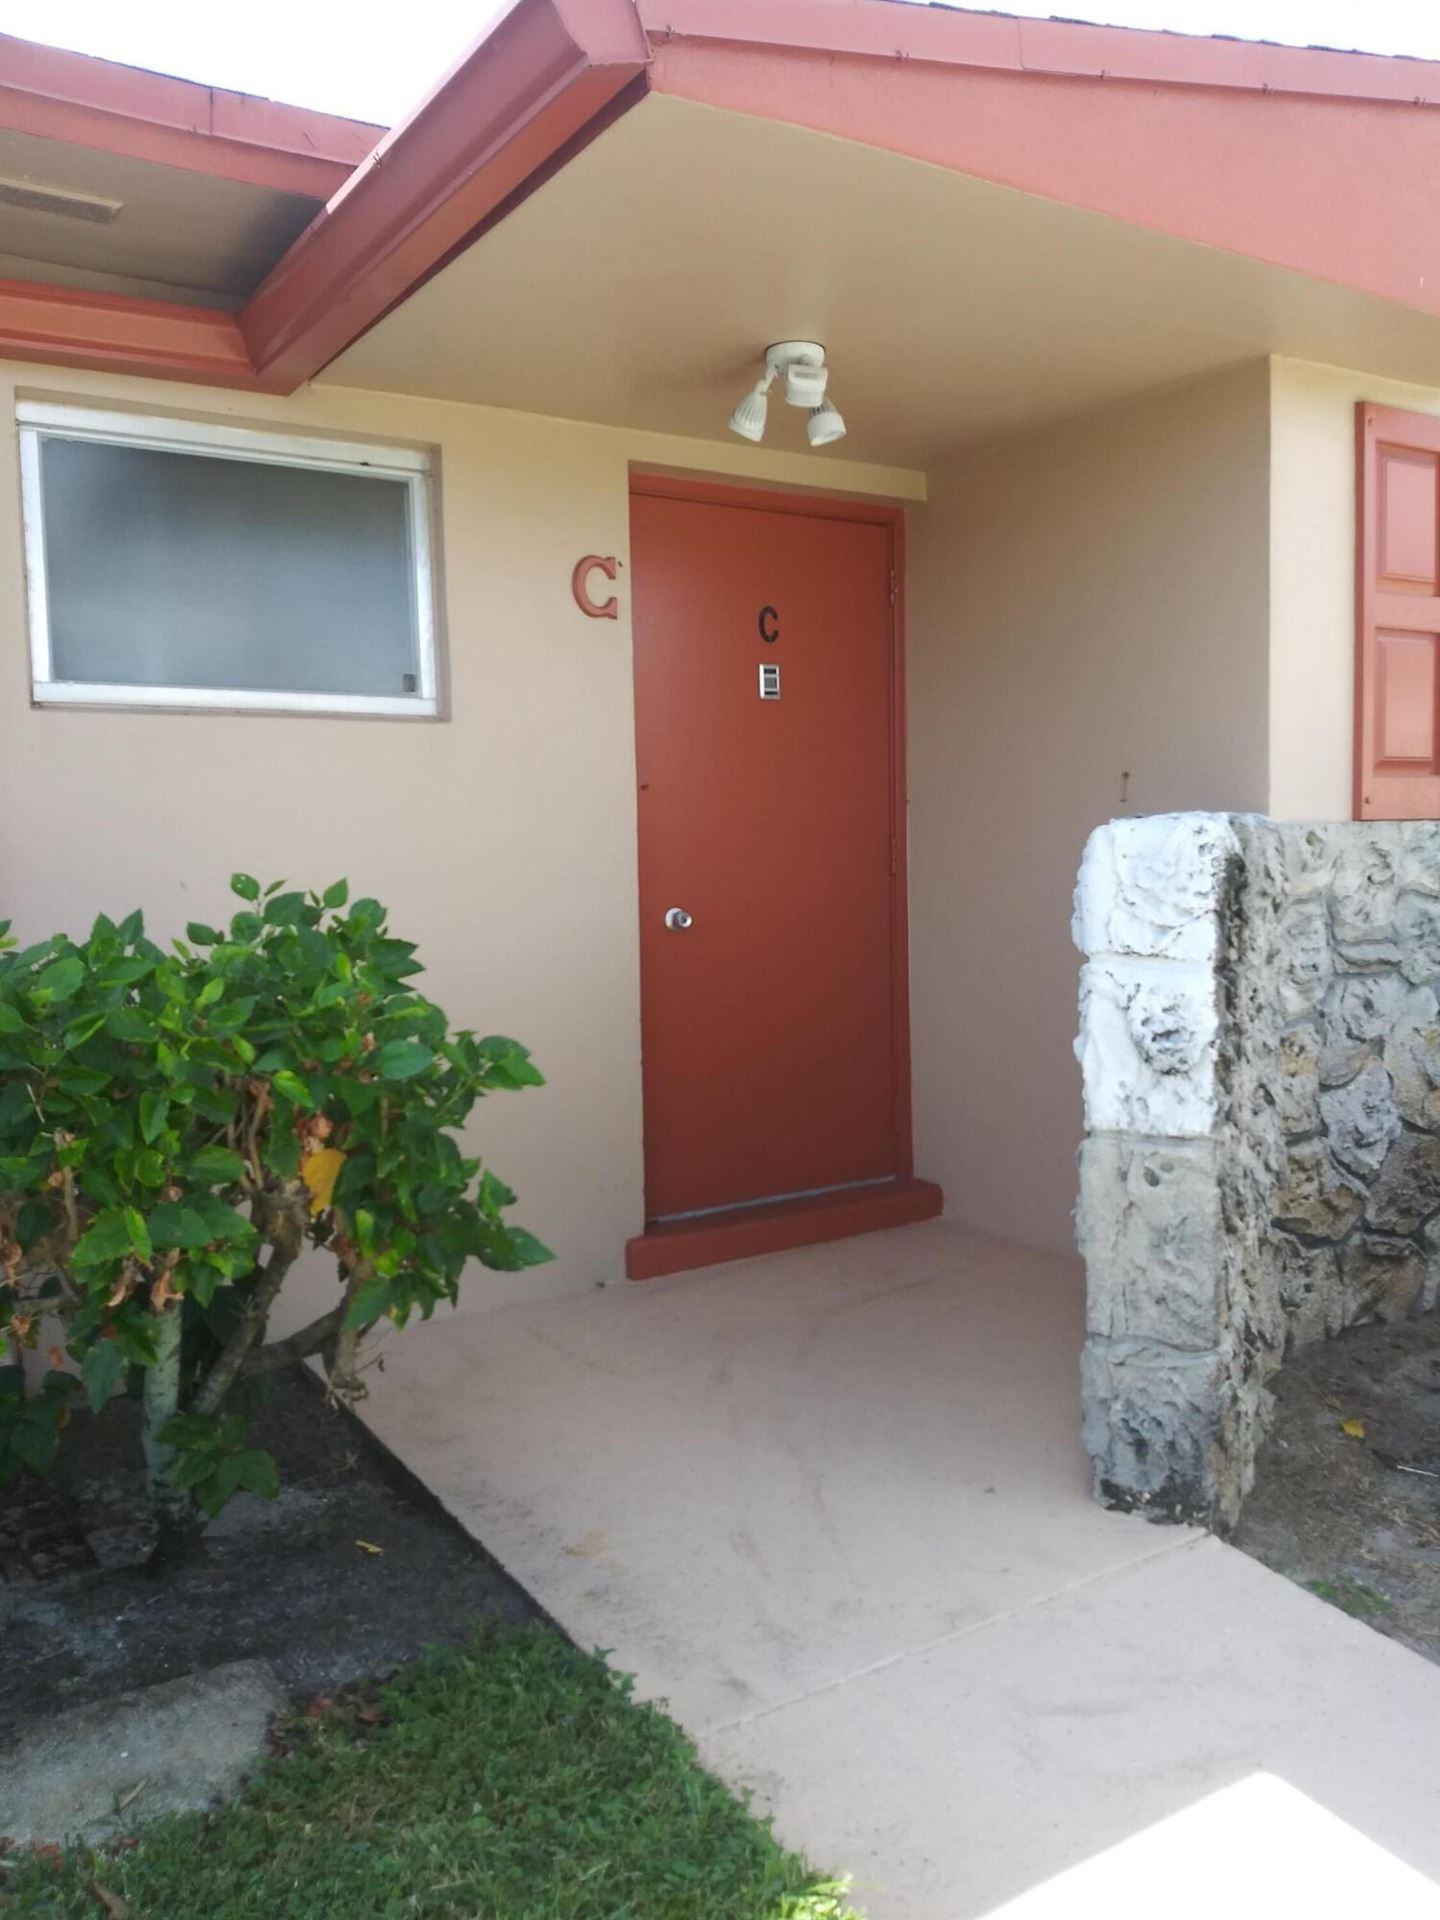 2961 Crosley Drive W #C, West Palm Beach, FL 33415 - MLS#: RX-10750526